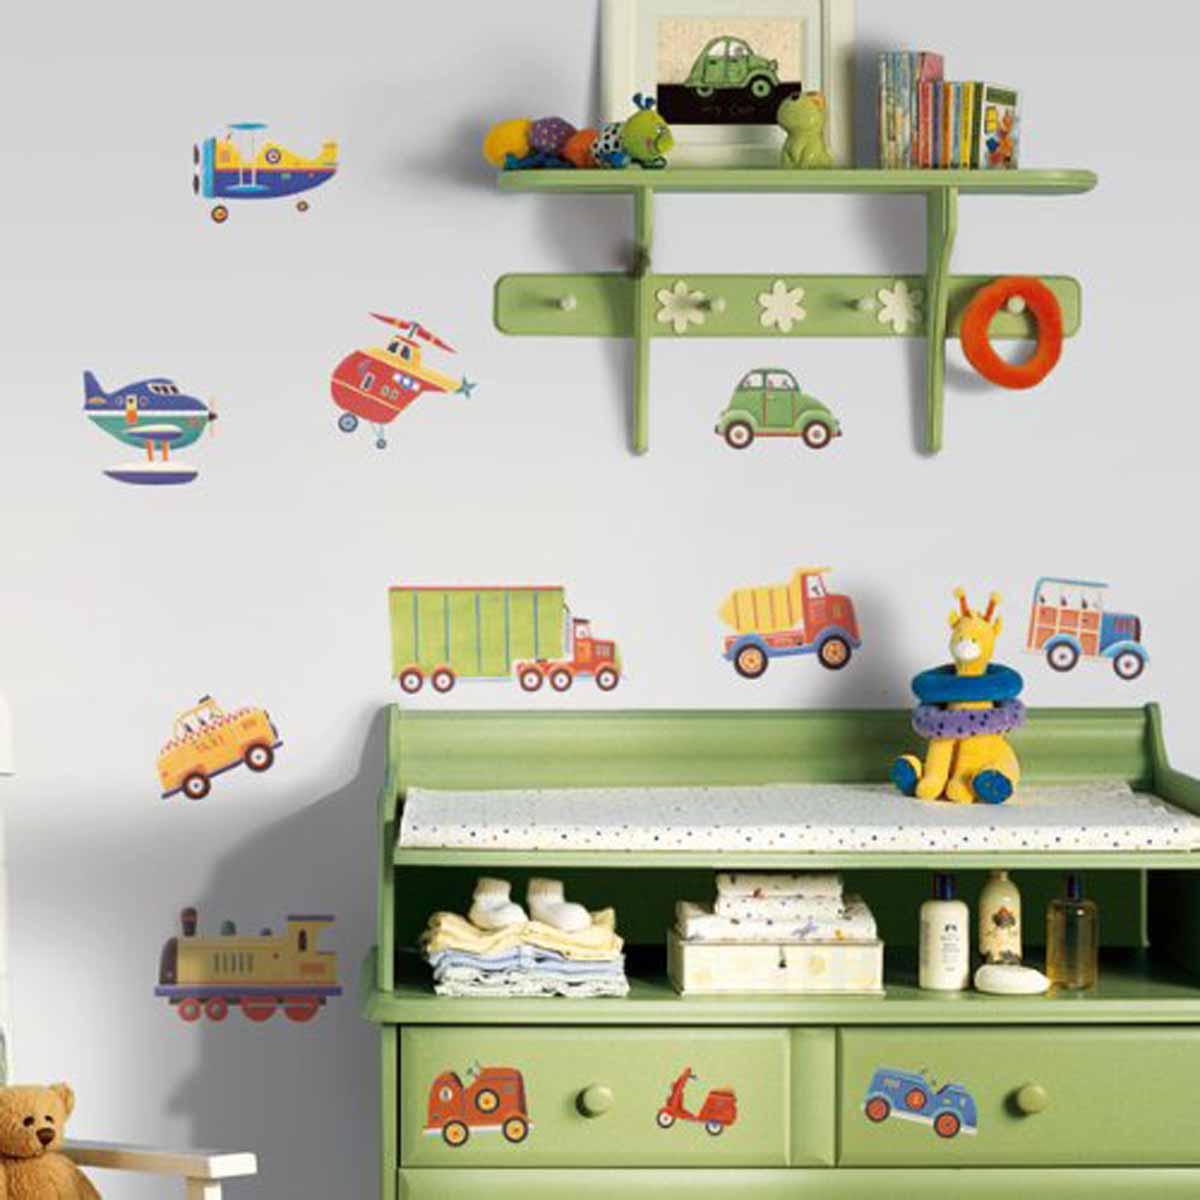 RoomMates Наклейка интерьерная Транспорт 26 шт -  Детская комната